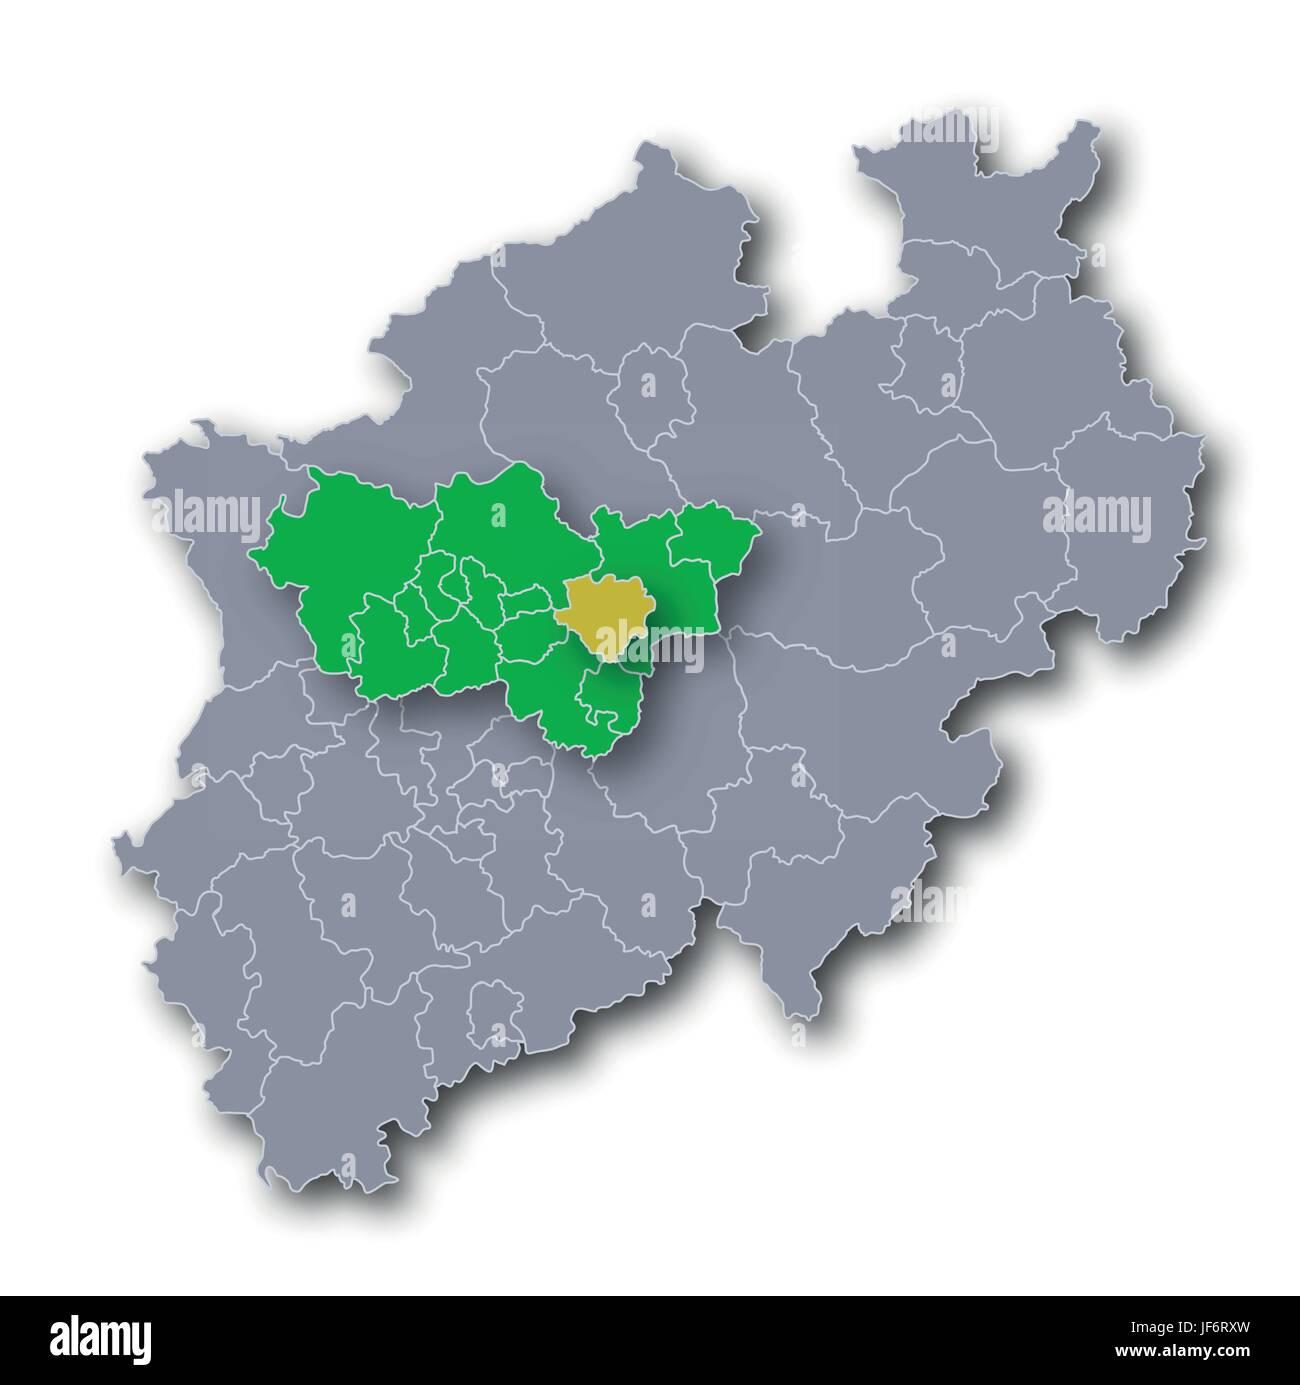 city, town, metropolis, card, urban area, westphalia, proud, pride, city, town, Stock Vector